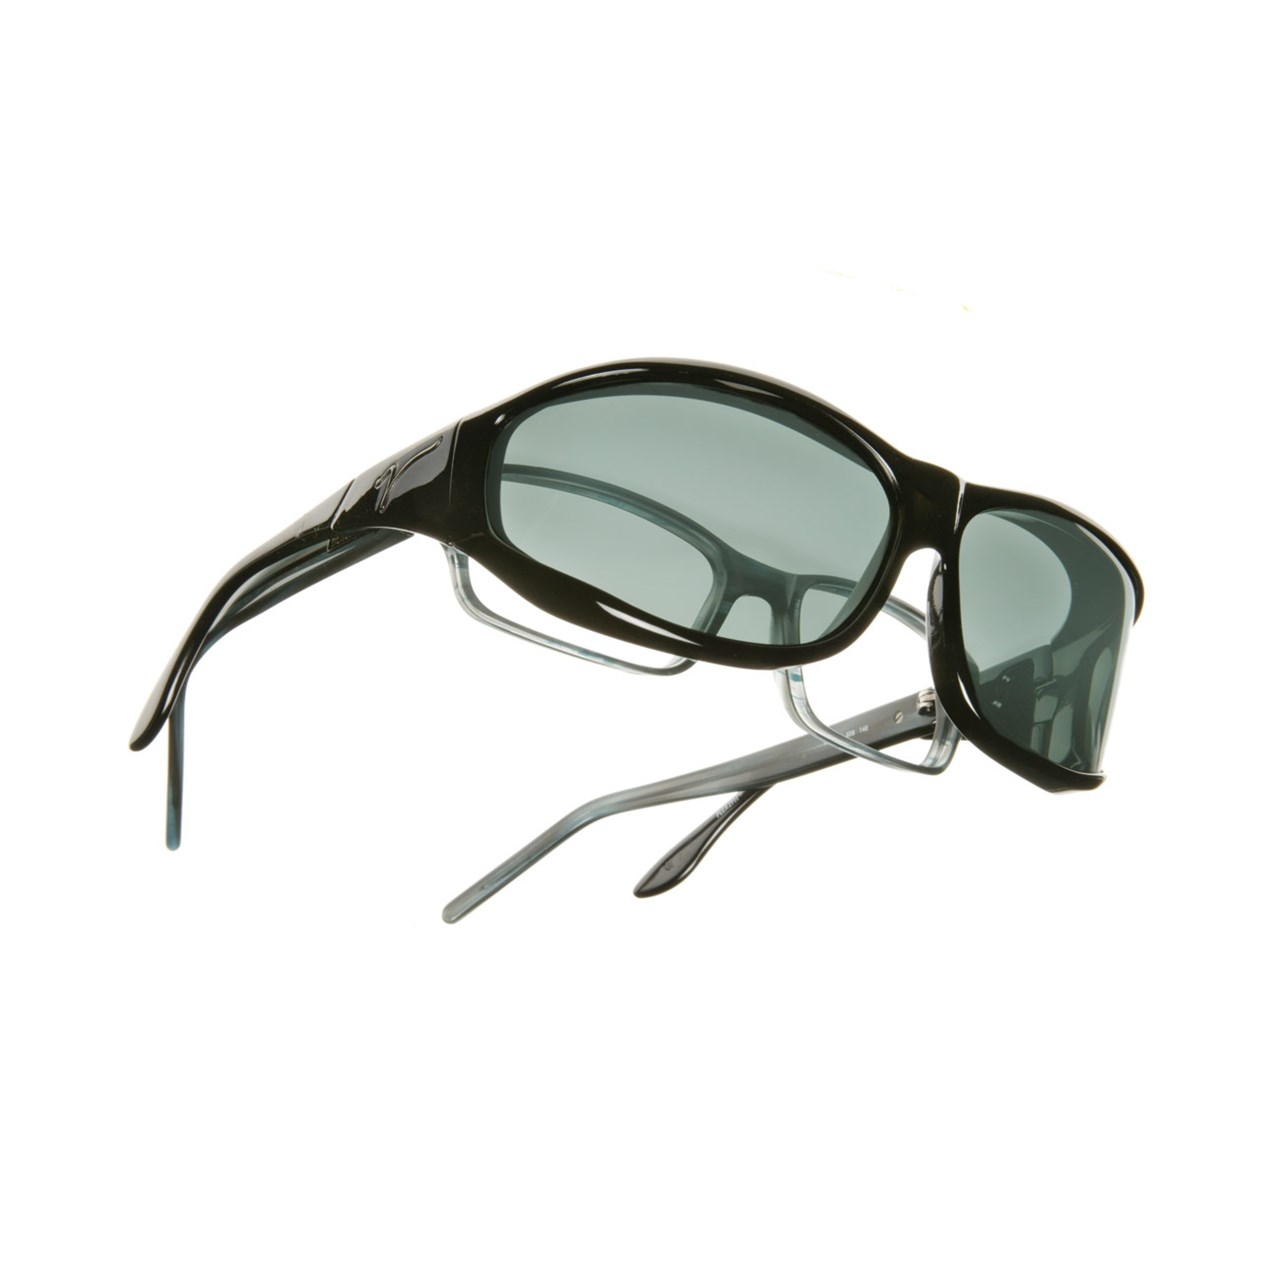 c38808e048a1 MaxiAids   Vistana Polarized Sunwear - Black Frame with Gray Lens ...